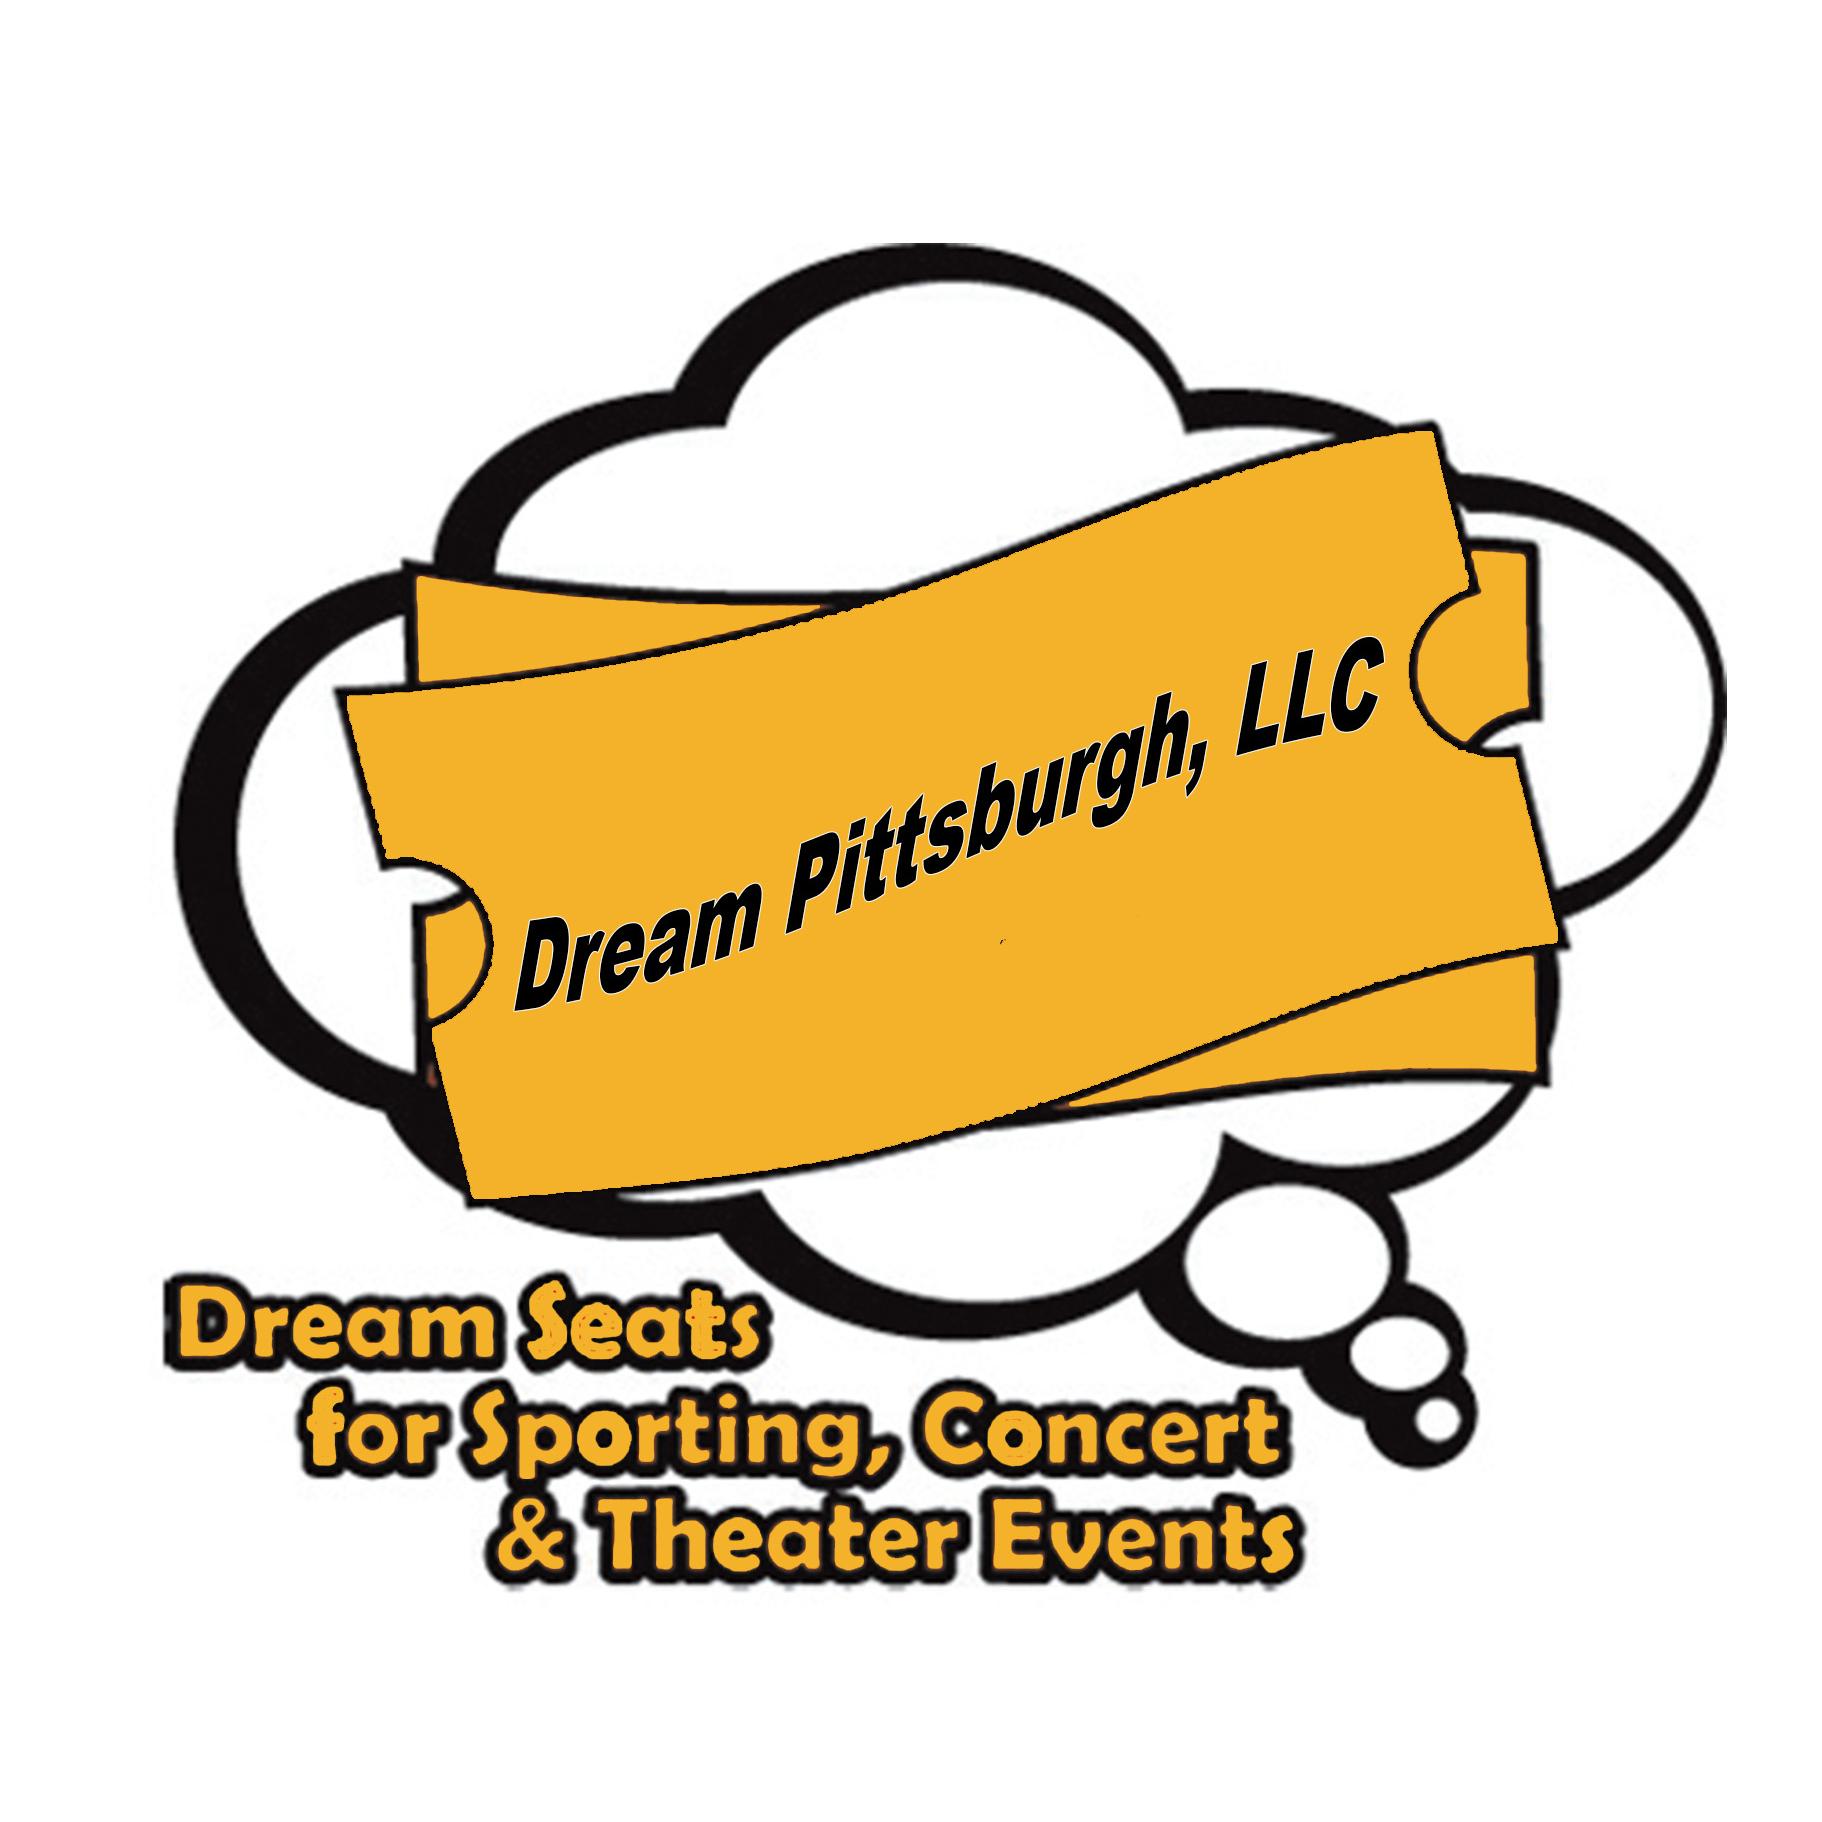 Dream Pittsburgh, LLC